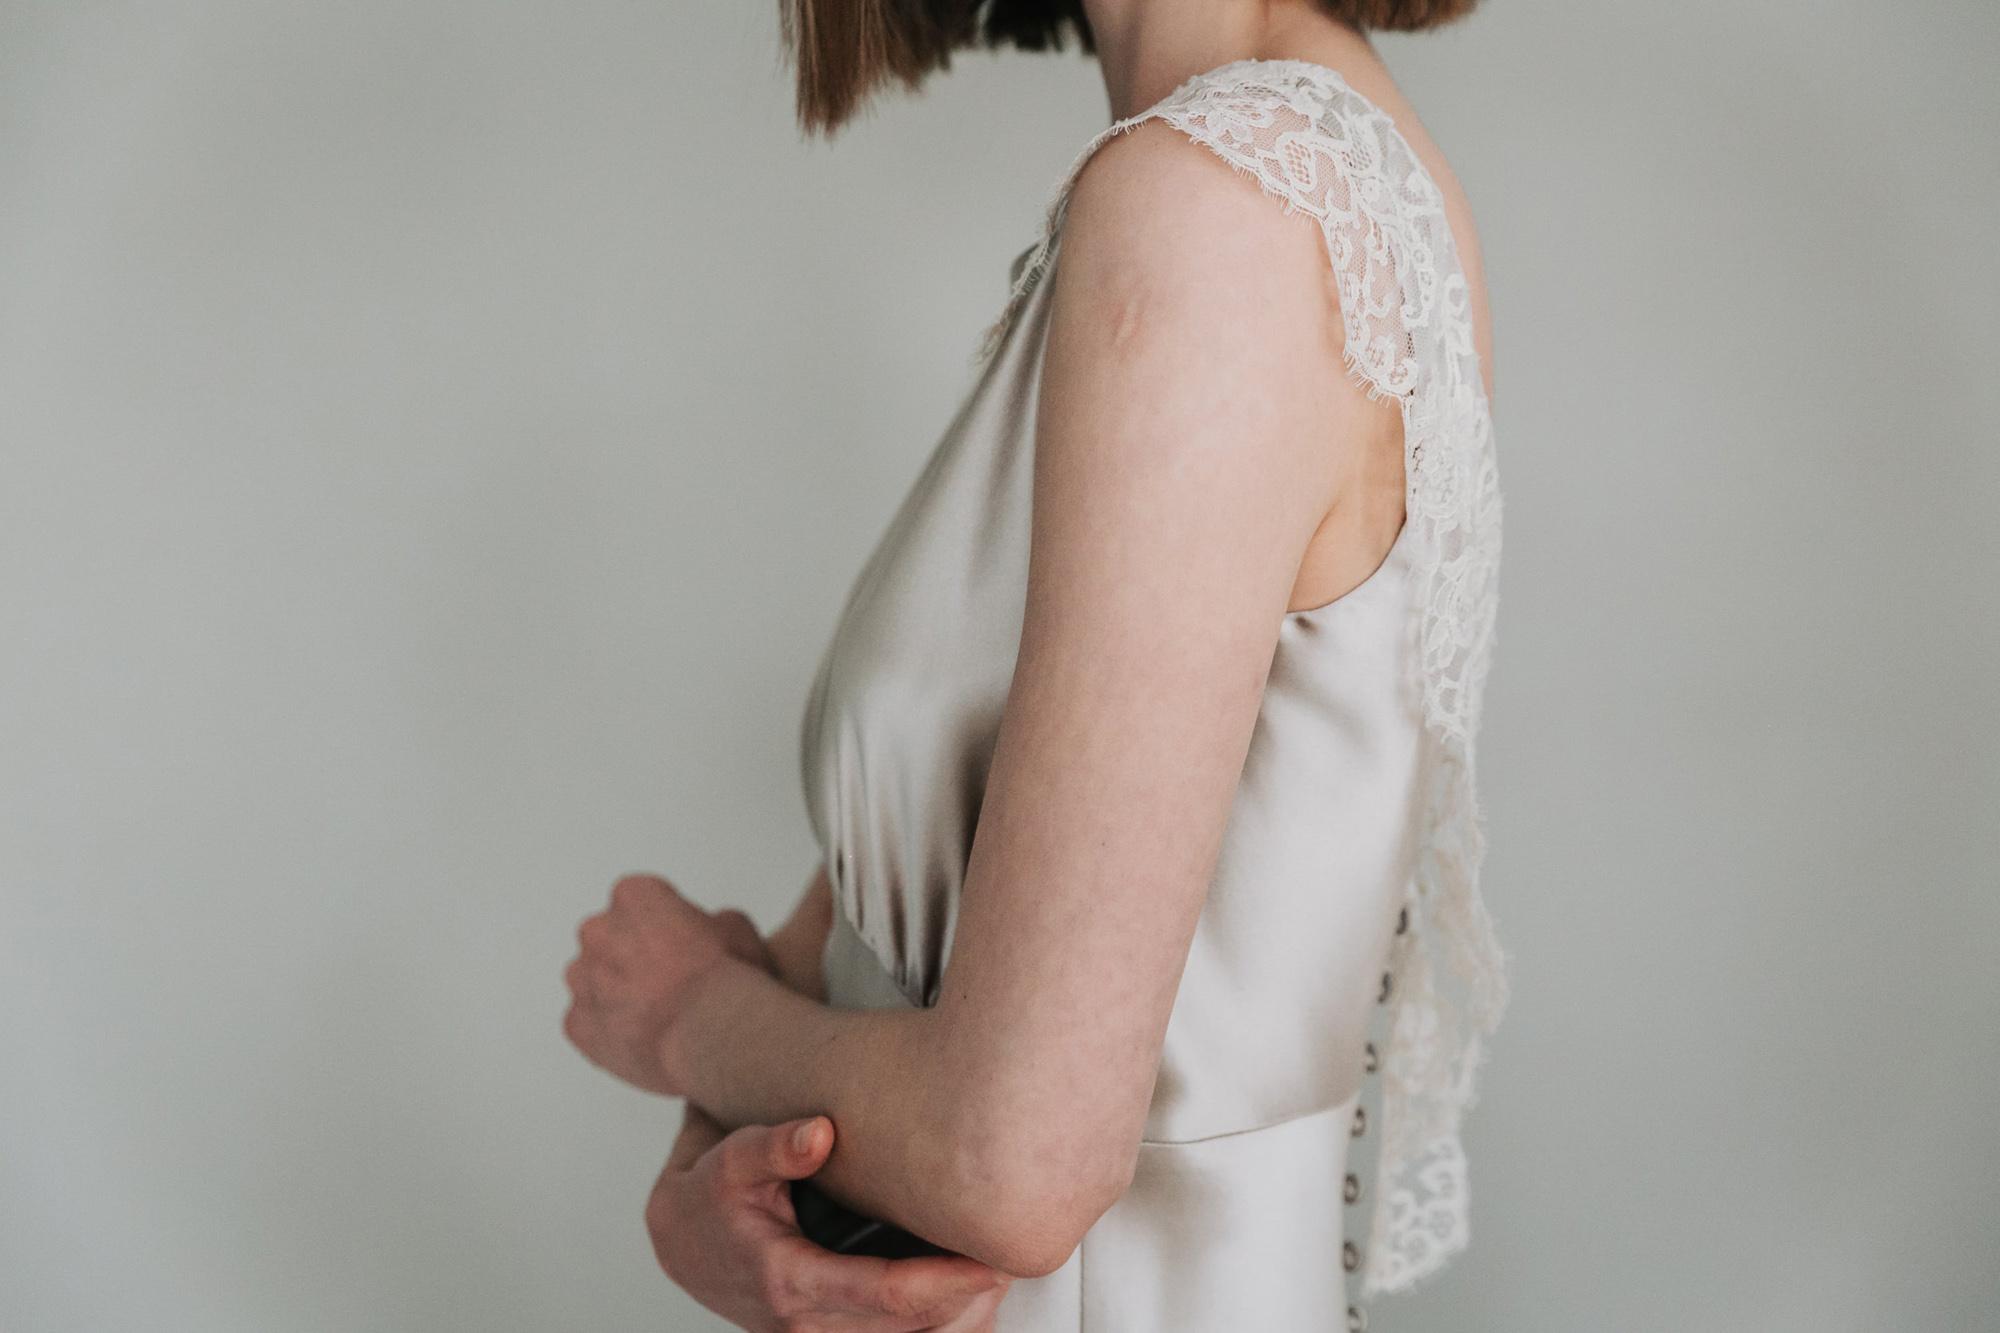 Kate-Beaumont-Sheffield-Honeysuckle-Bias-Cut-Silk-Panelled-Wedding-Gown-14.jpg